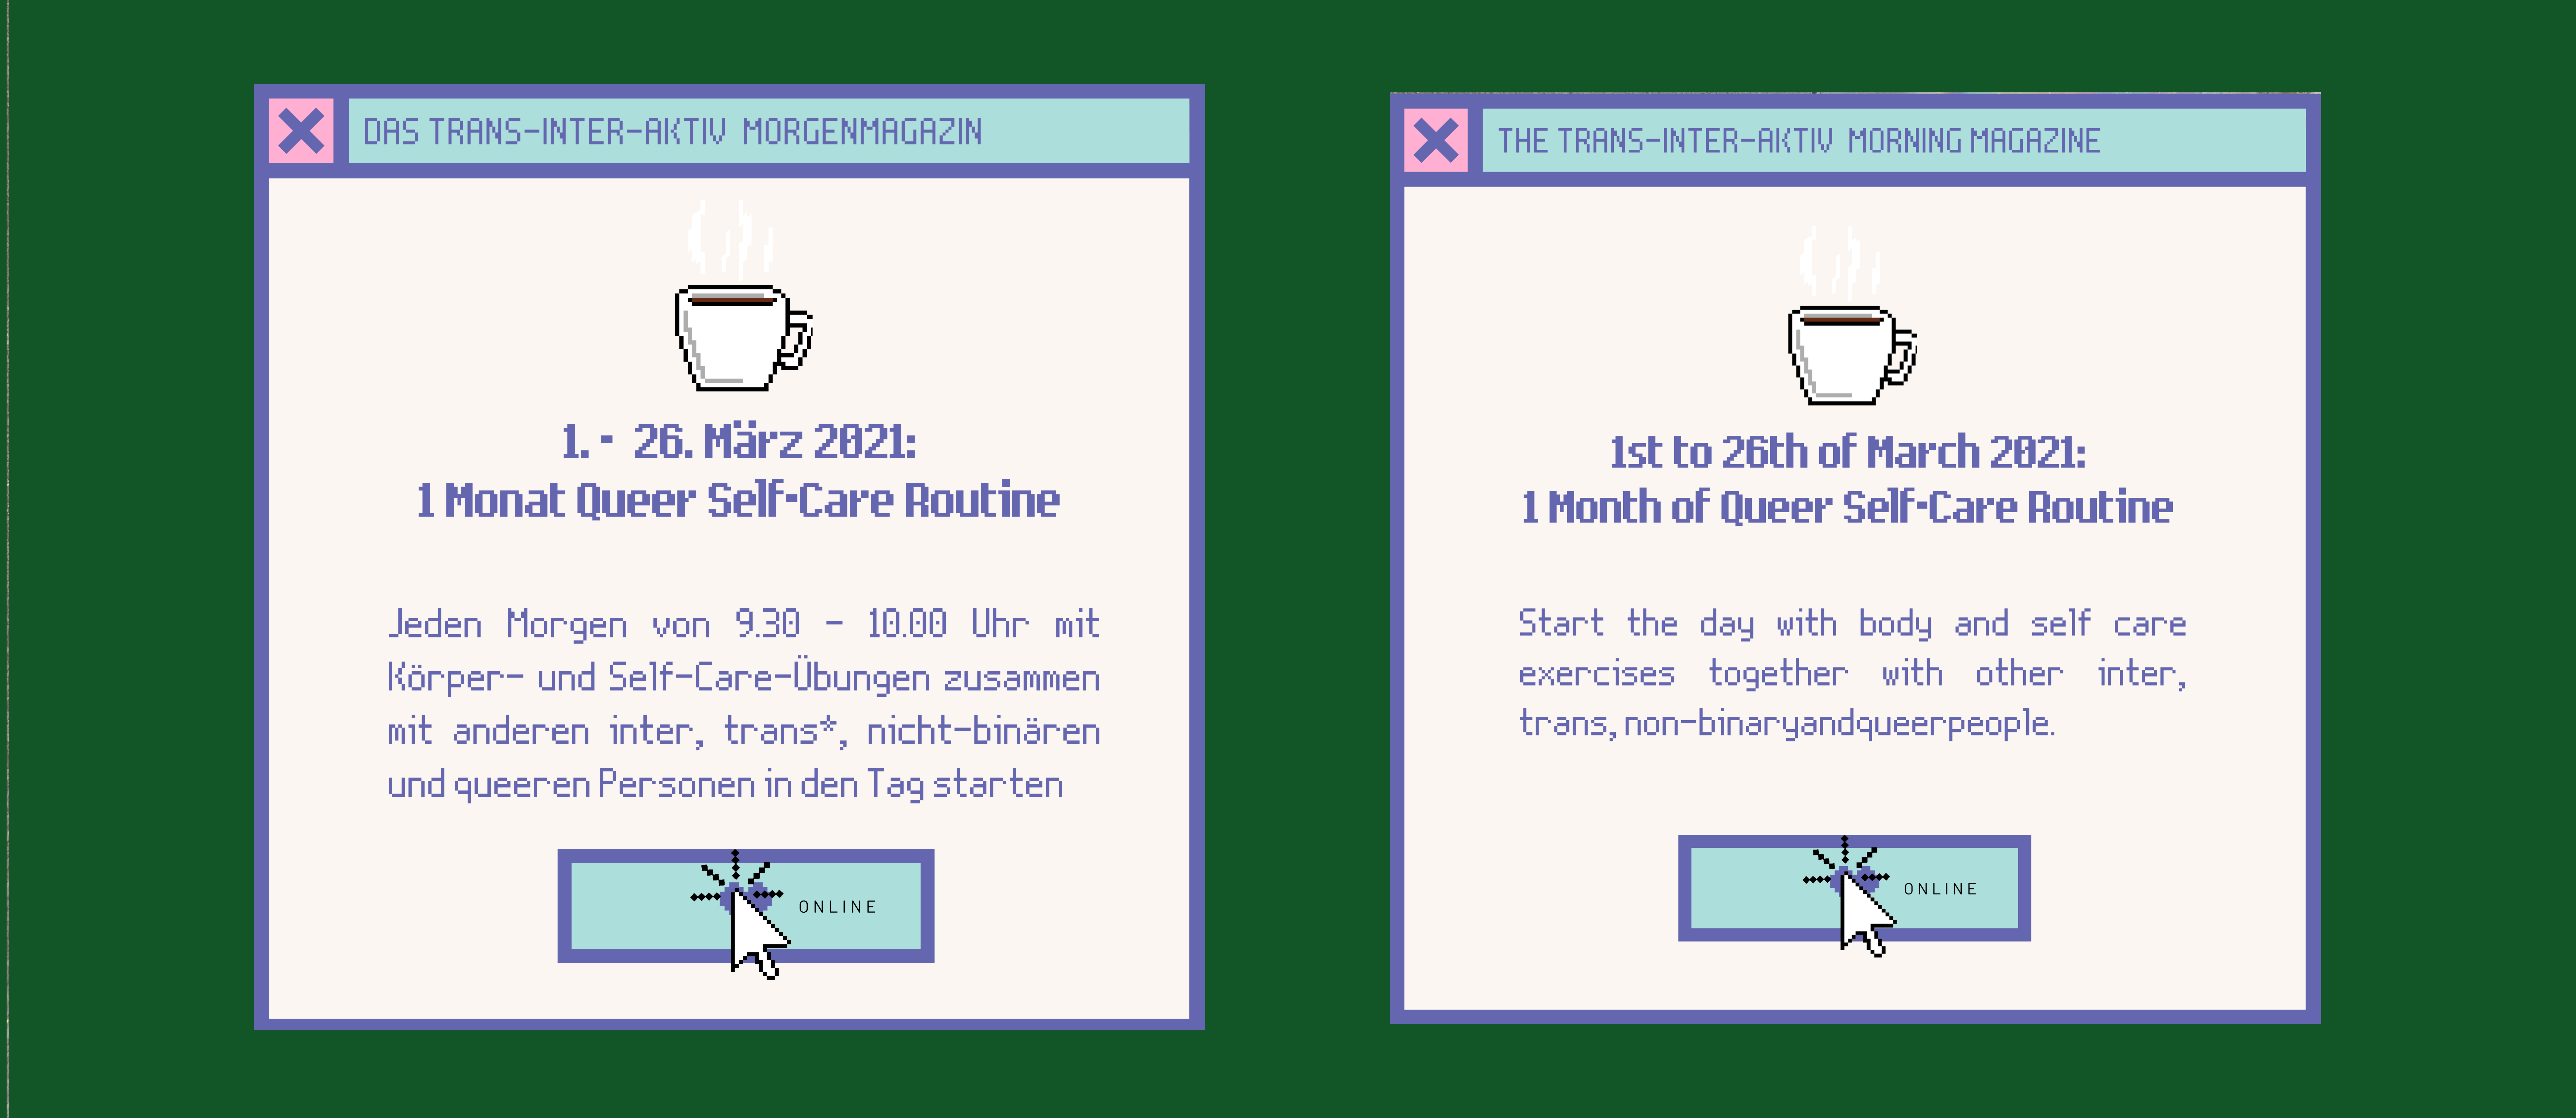 Trans-Inter-Aktiv Morgenmagazin: Queere Self Care Routine, 1.-26. März 2021 | Mo-Fr 9:30–10:00